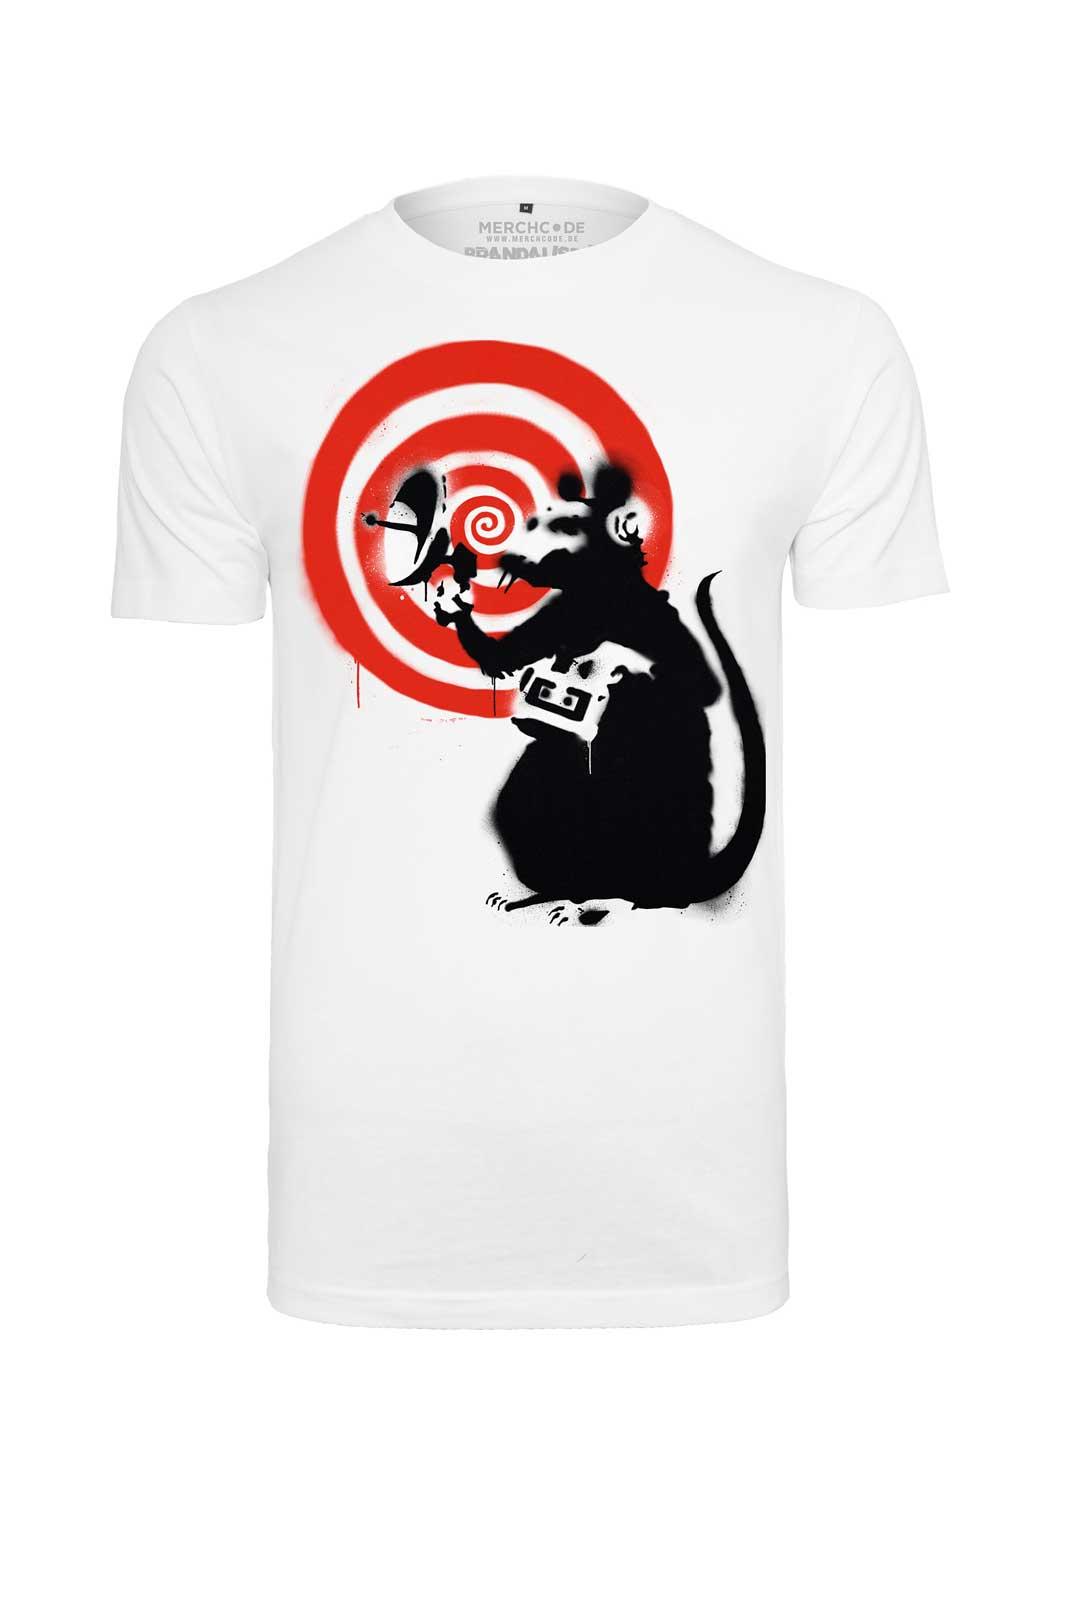 Tee Banksy Spy Rat